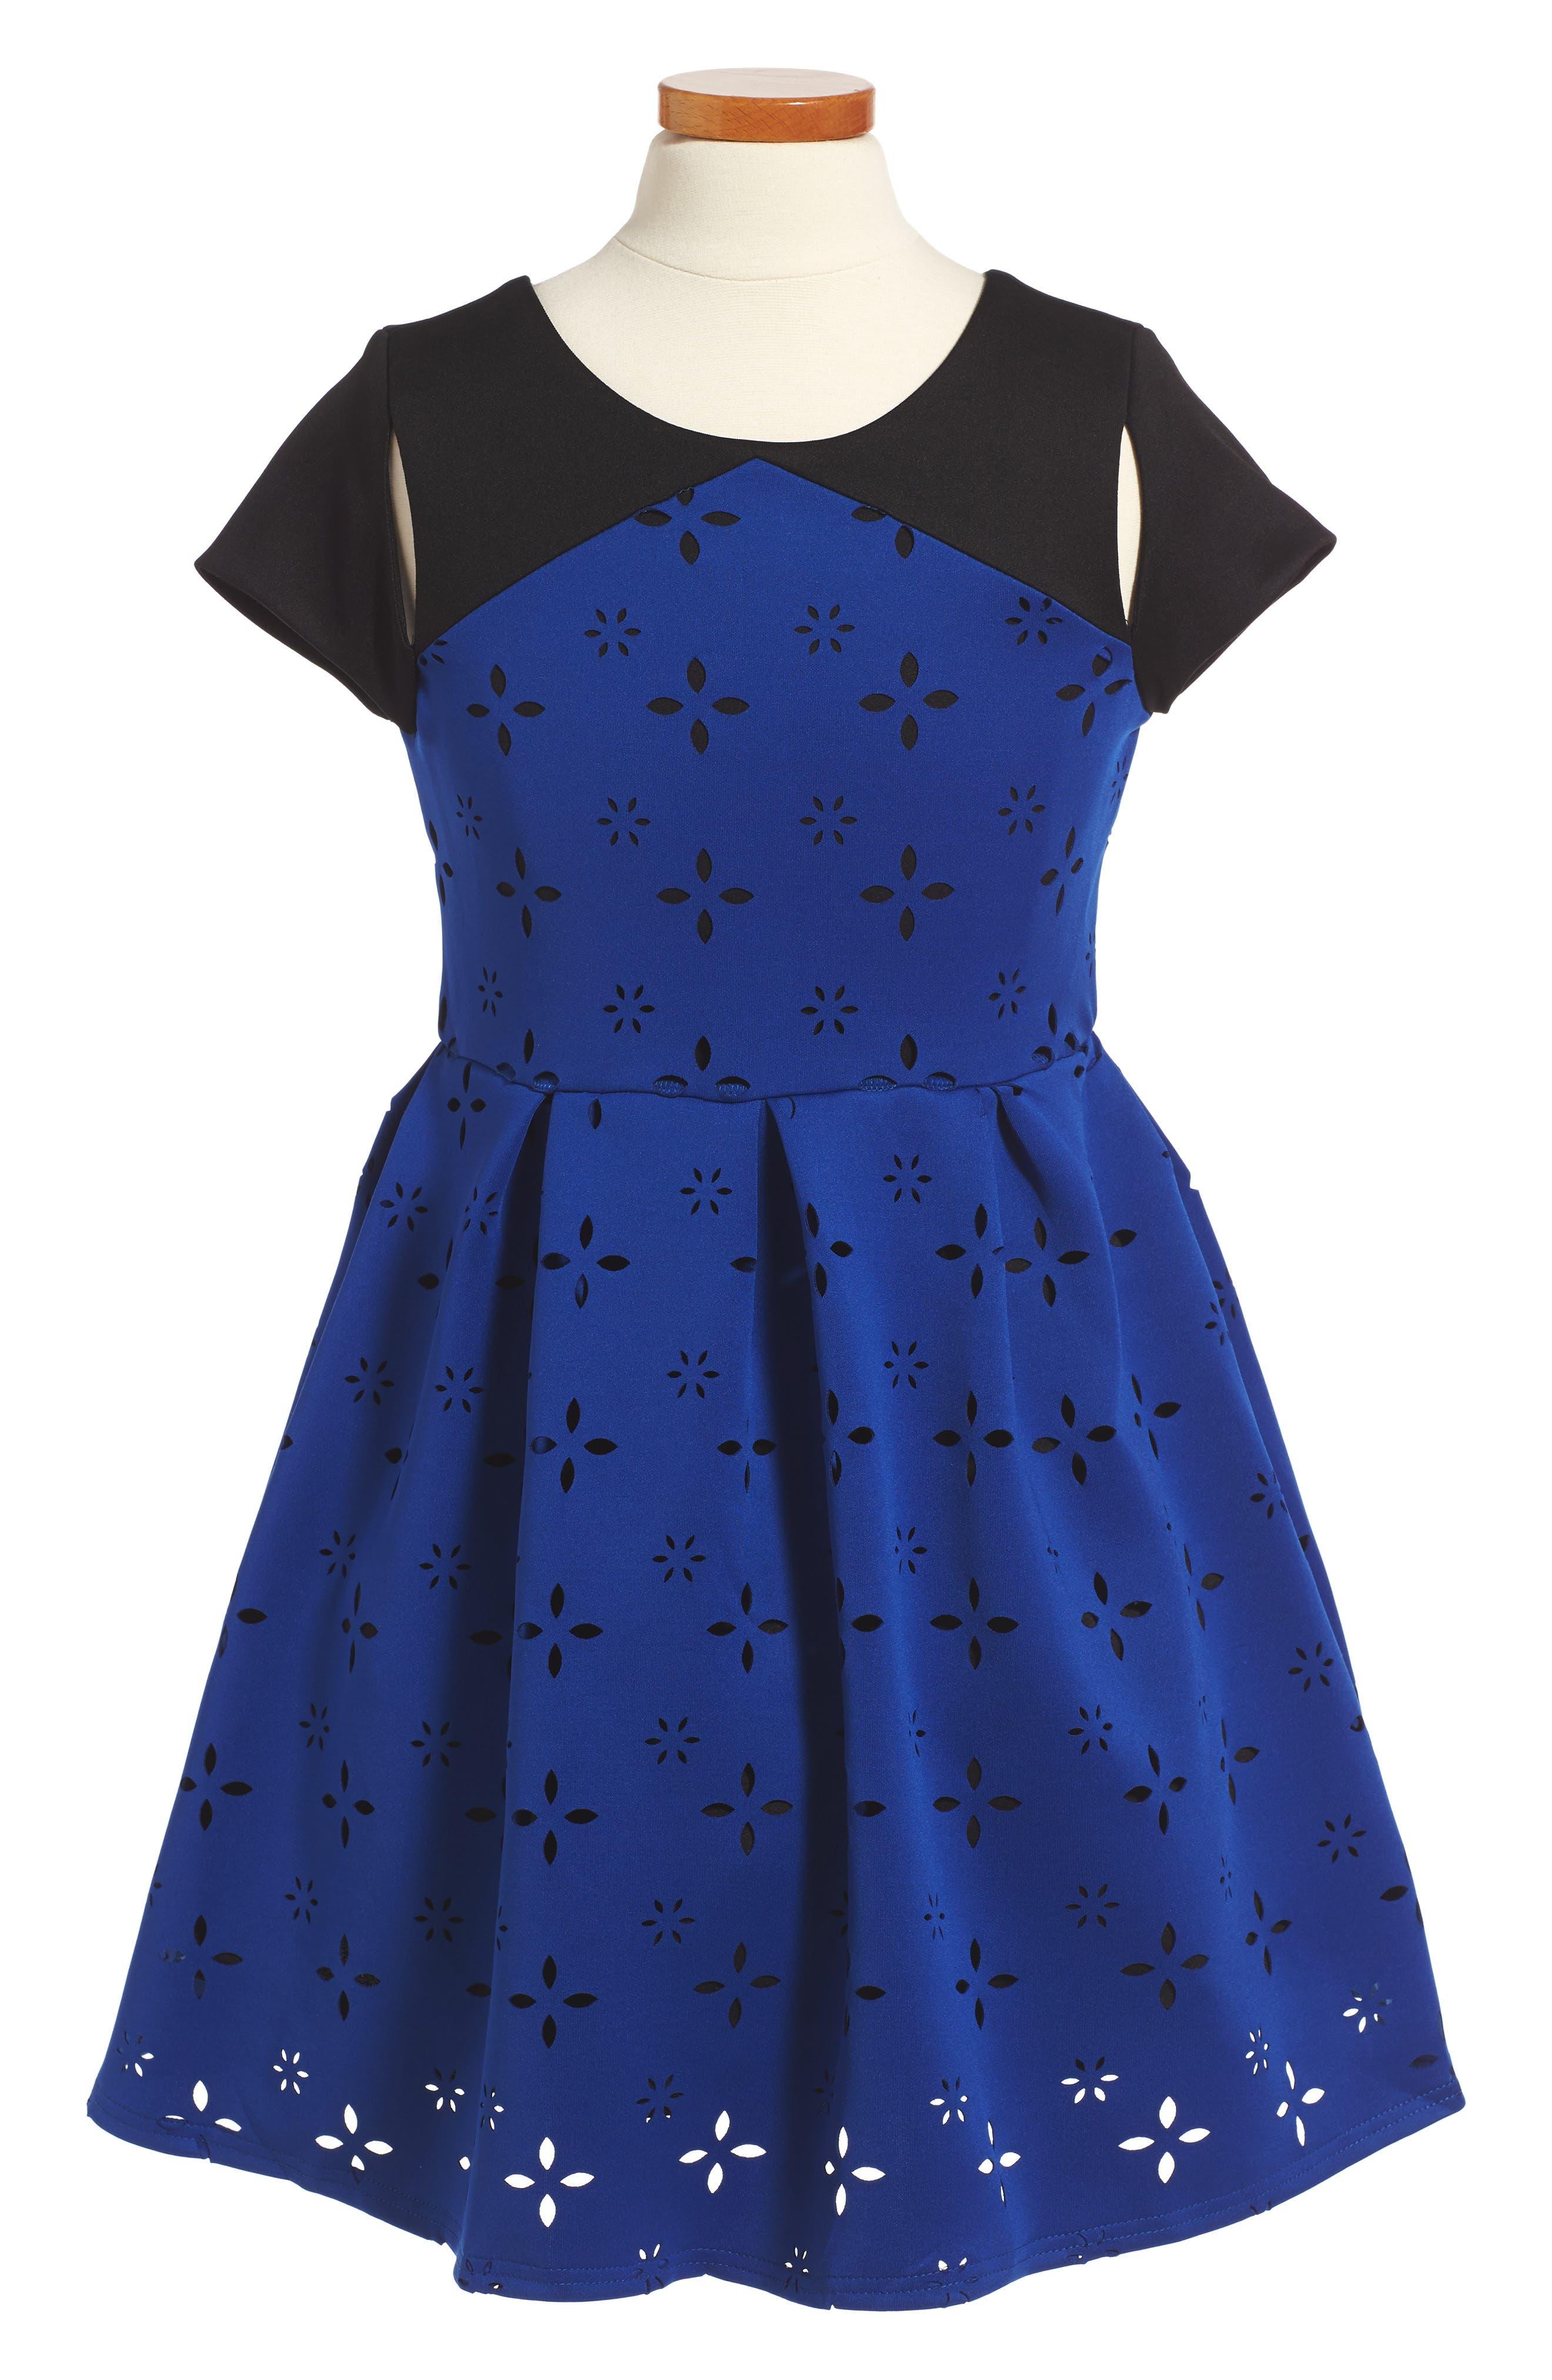 Alternate Image 1 Selected - Blush by Us Angels Cutout Dress (Big Girls)